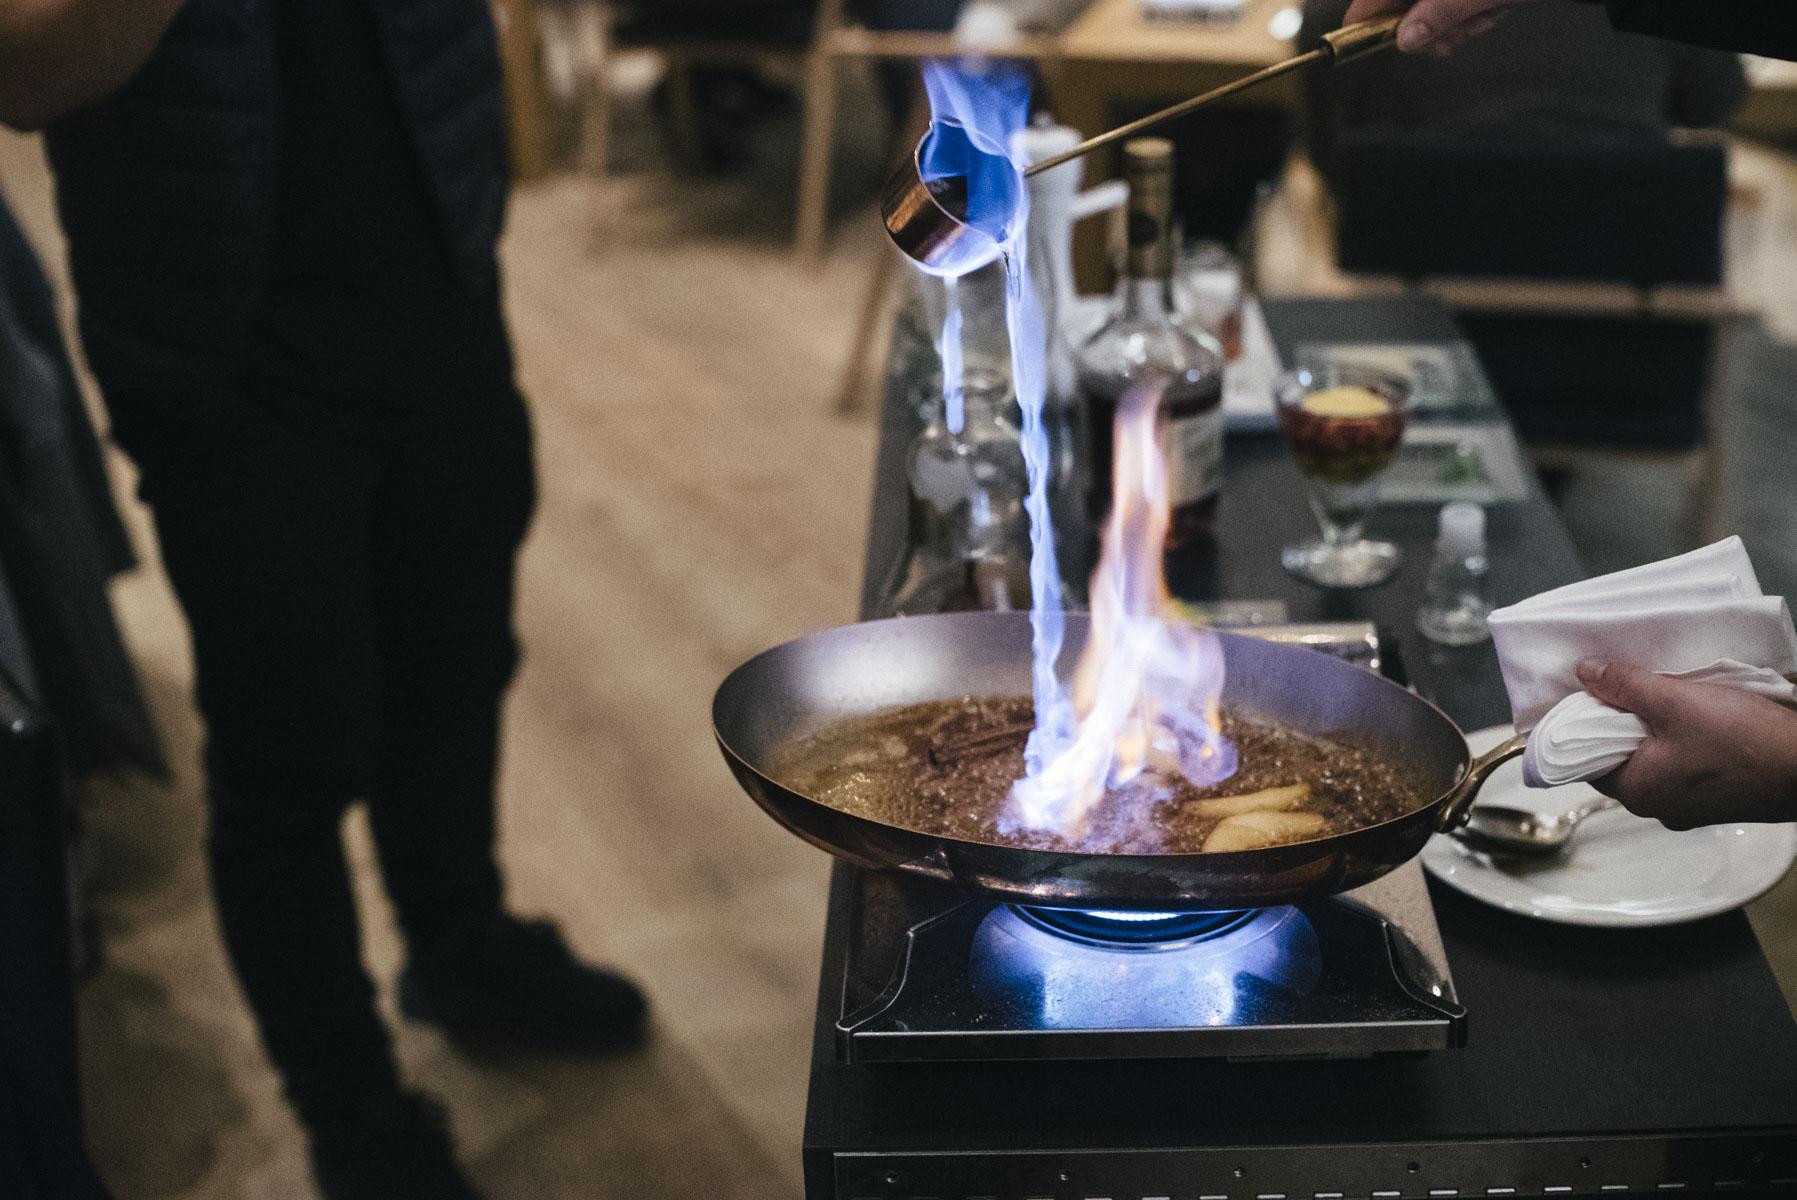 tokyo-japan-code-kurkku-kyoto-italian-restaurant-yoyogi-village-18